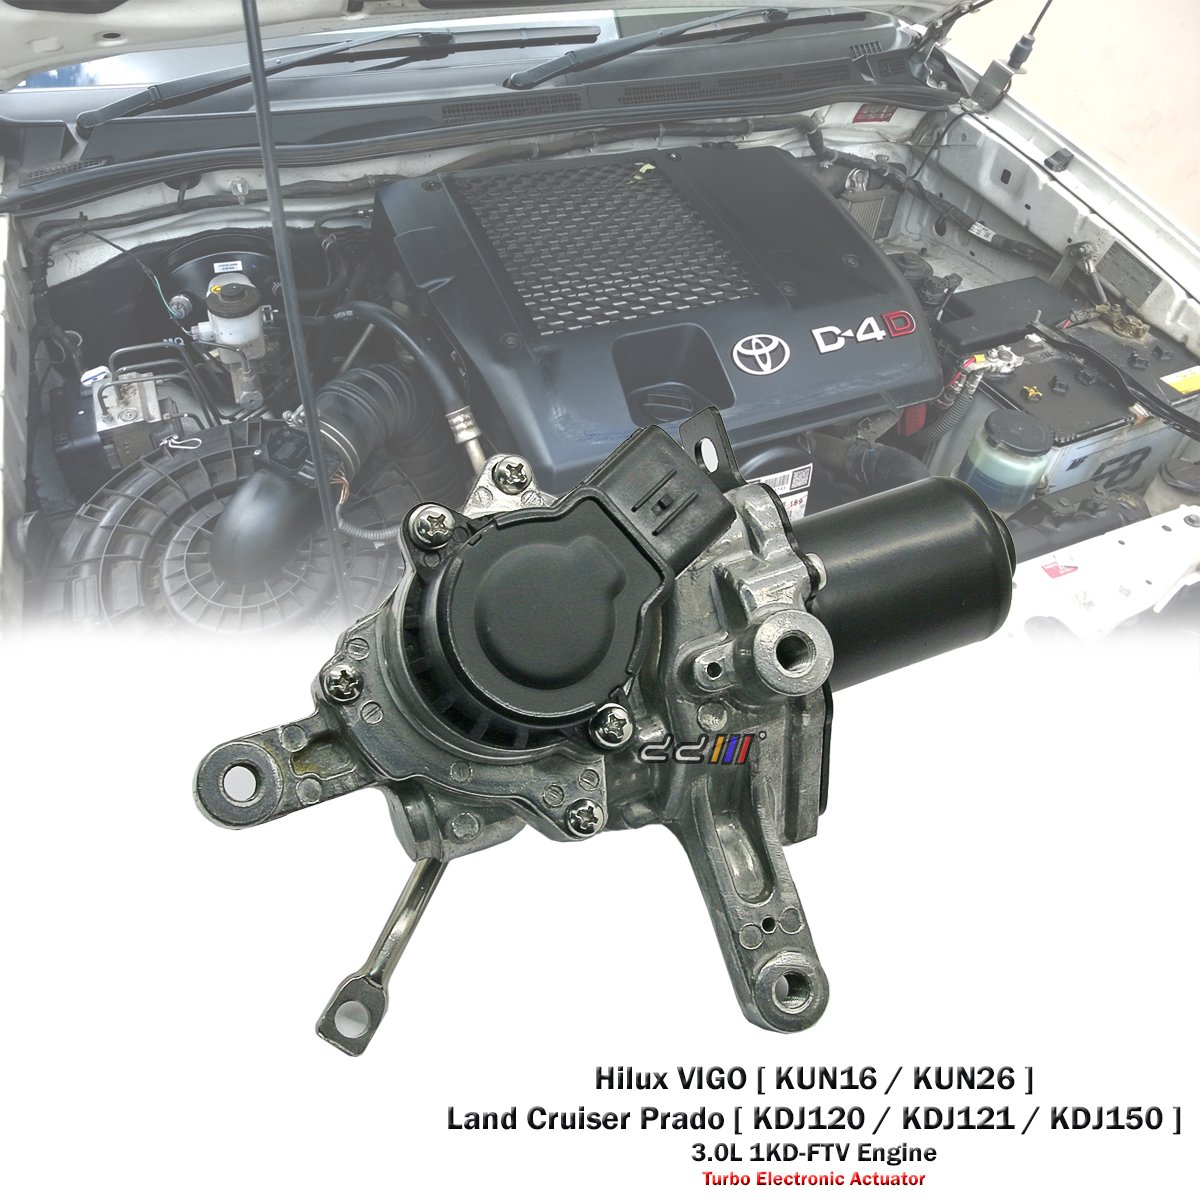 Turbo Electronic Actuator For Toyota Hilux VIGO D-4D KUN16 KUN26 1KD-FTV CT16V D&D (Drag&Drift)